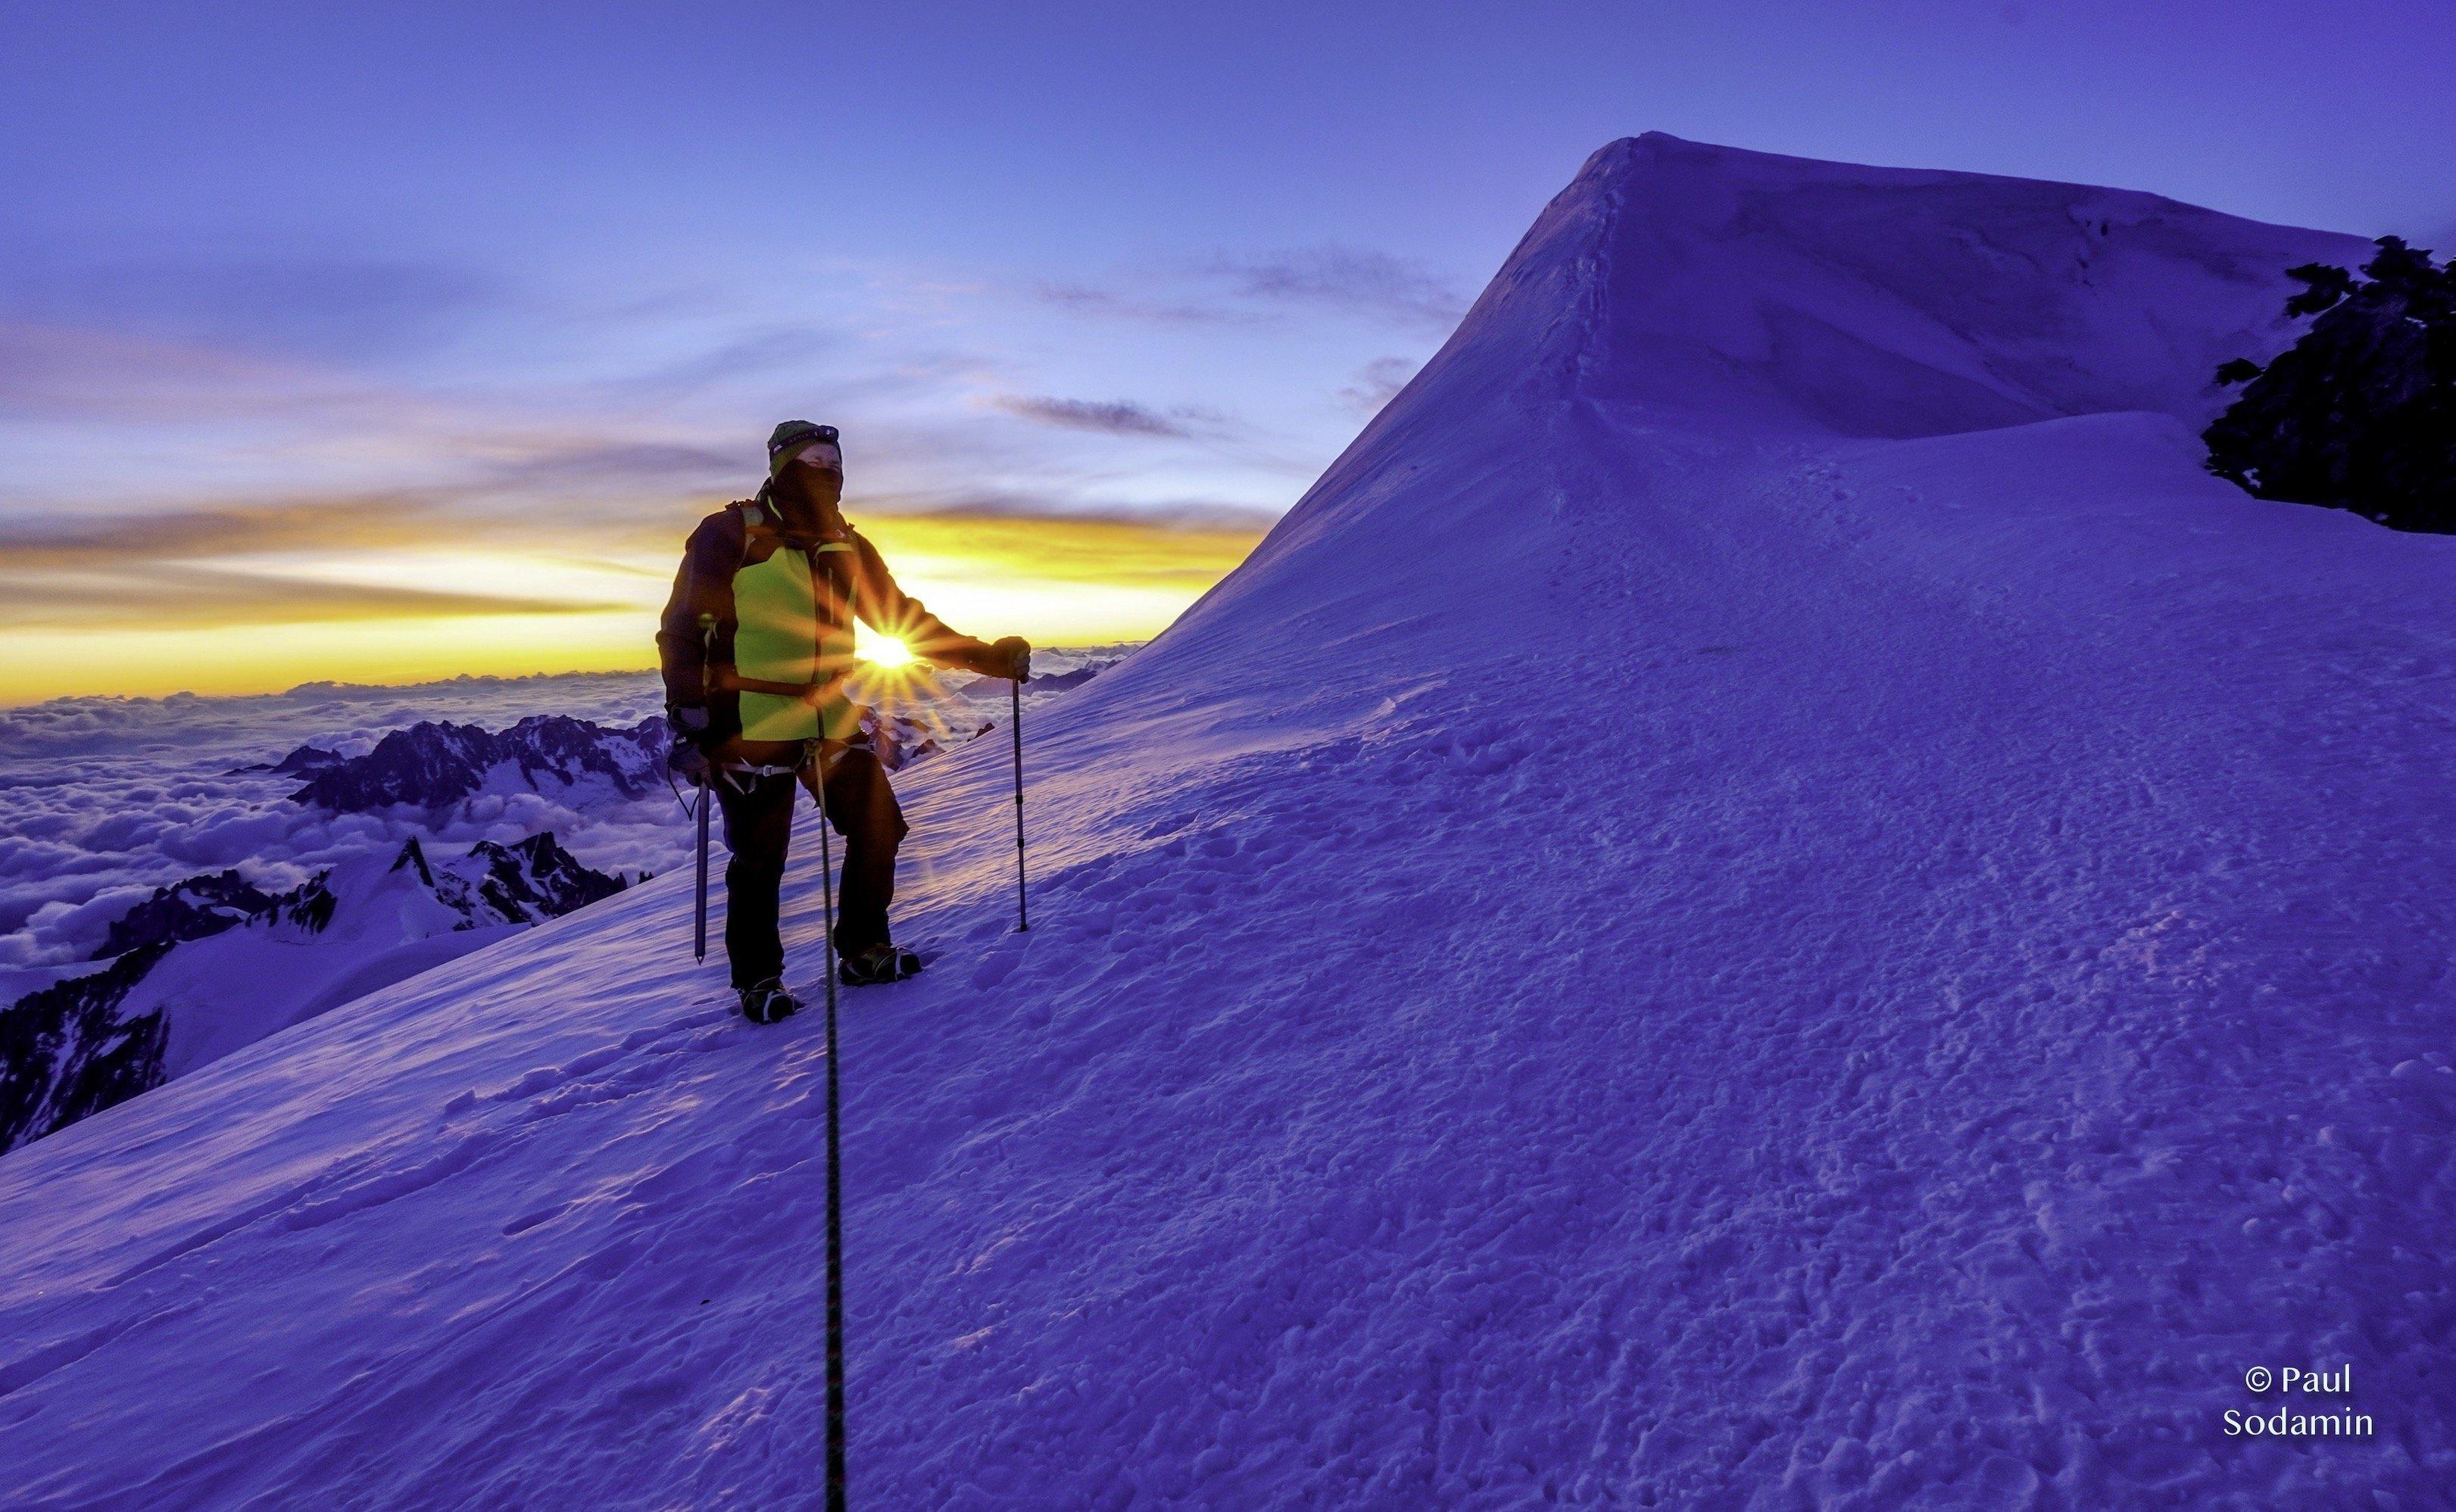 Mont Blanc 4810m bei Sonnenaufgang am Gipfel – Erlebnis PURE am 14.Juli 2020